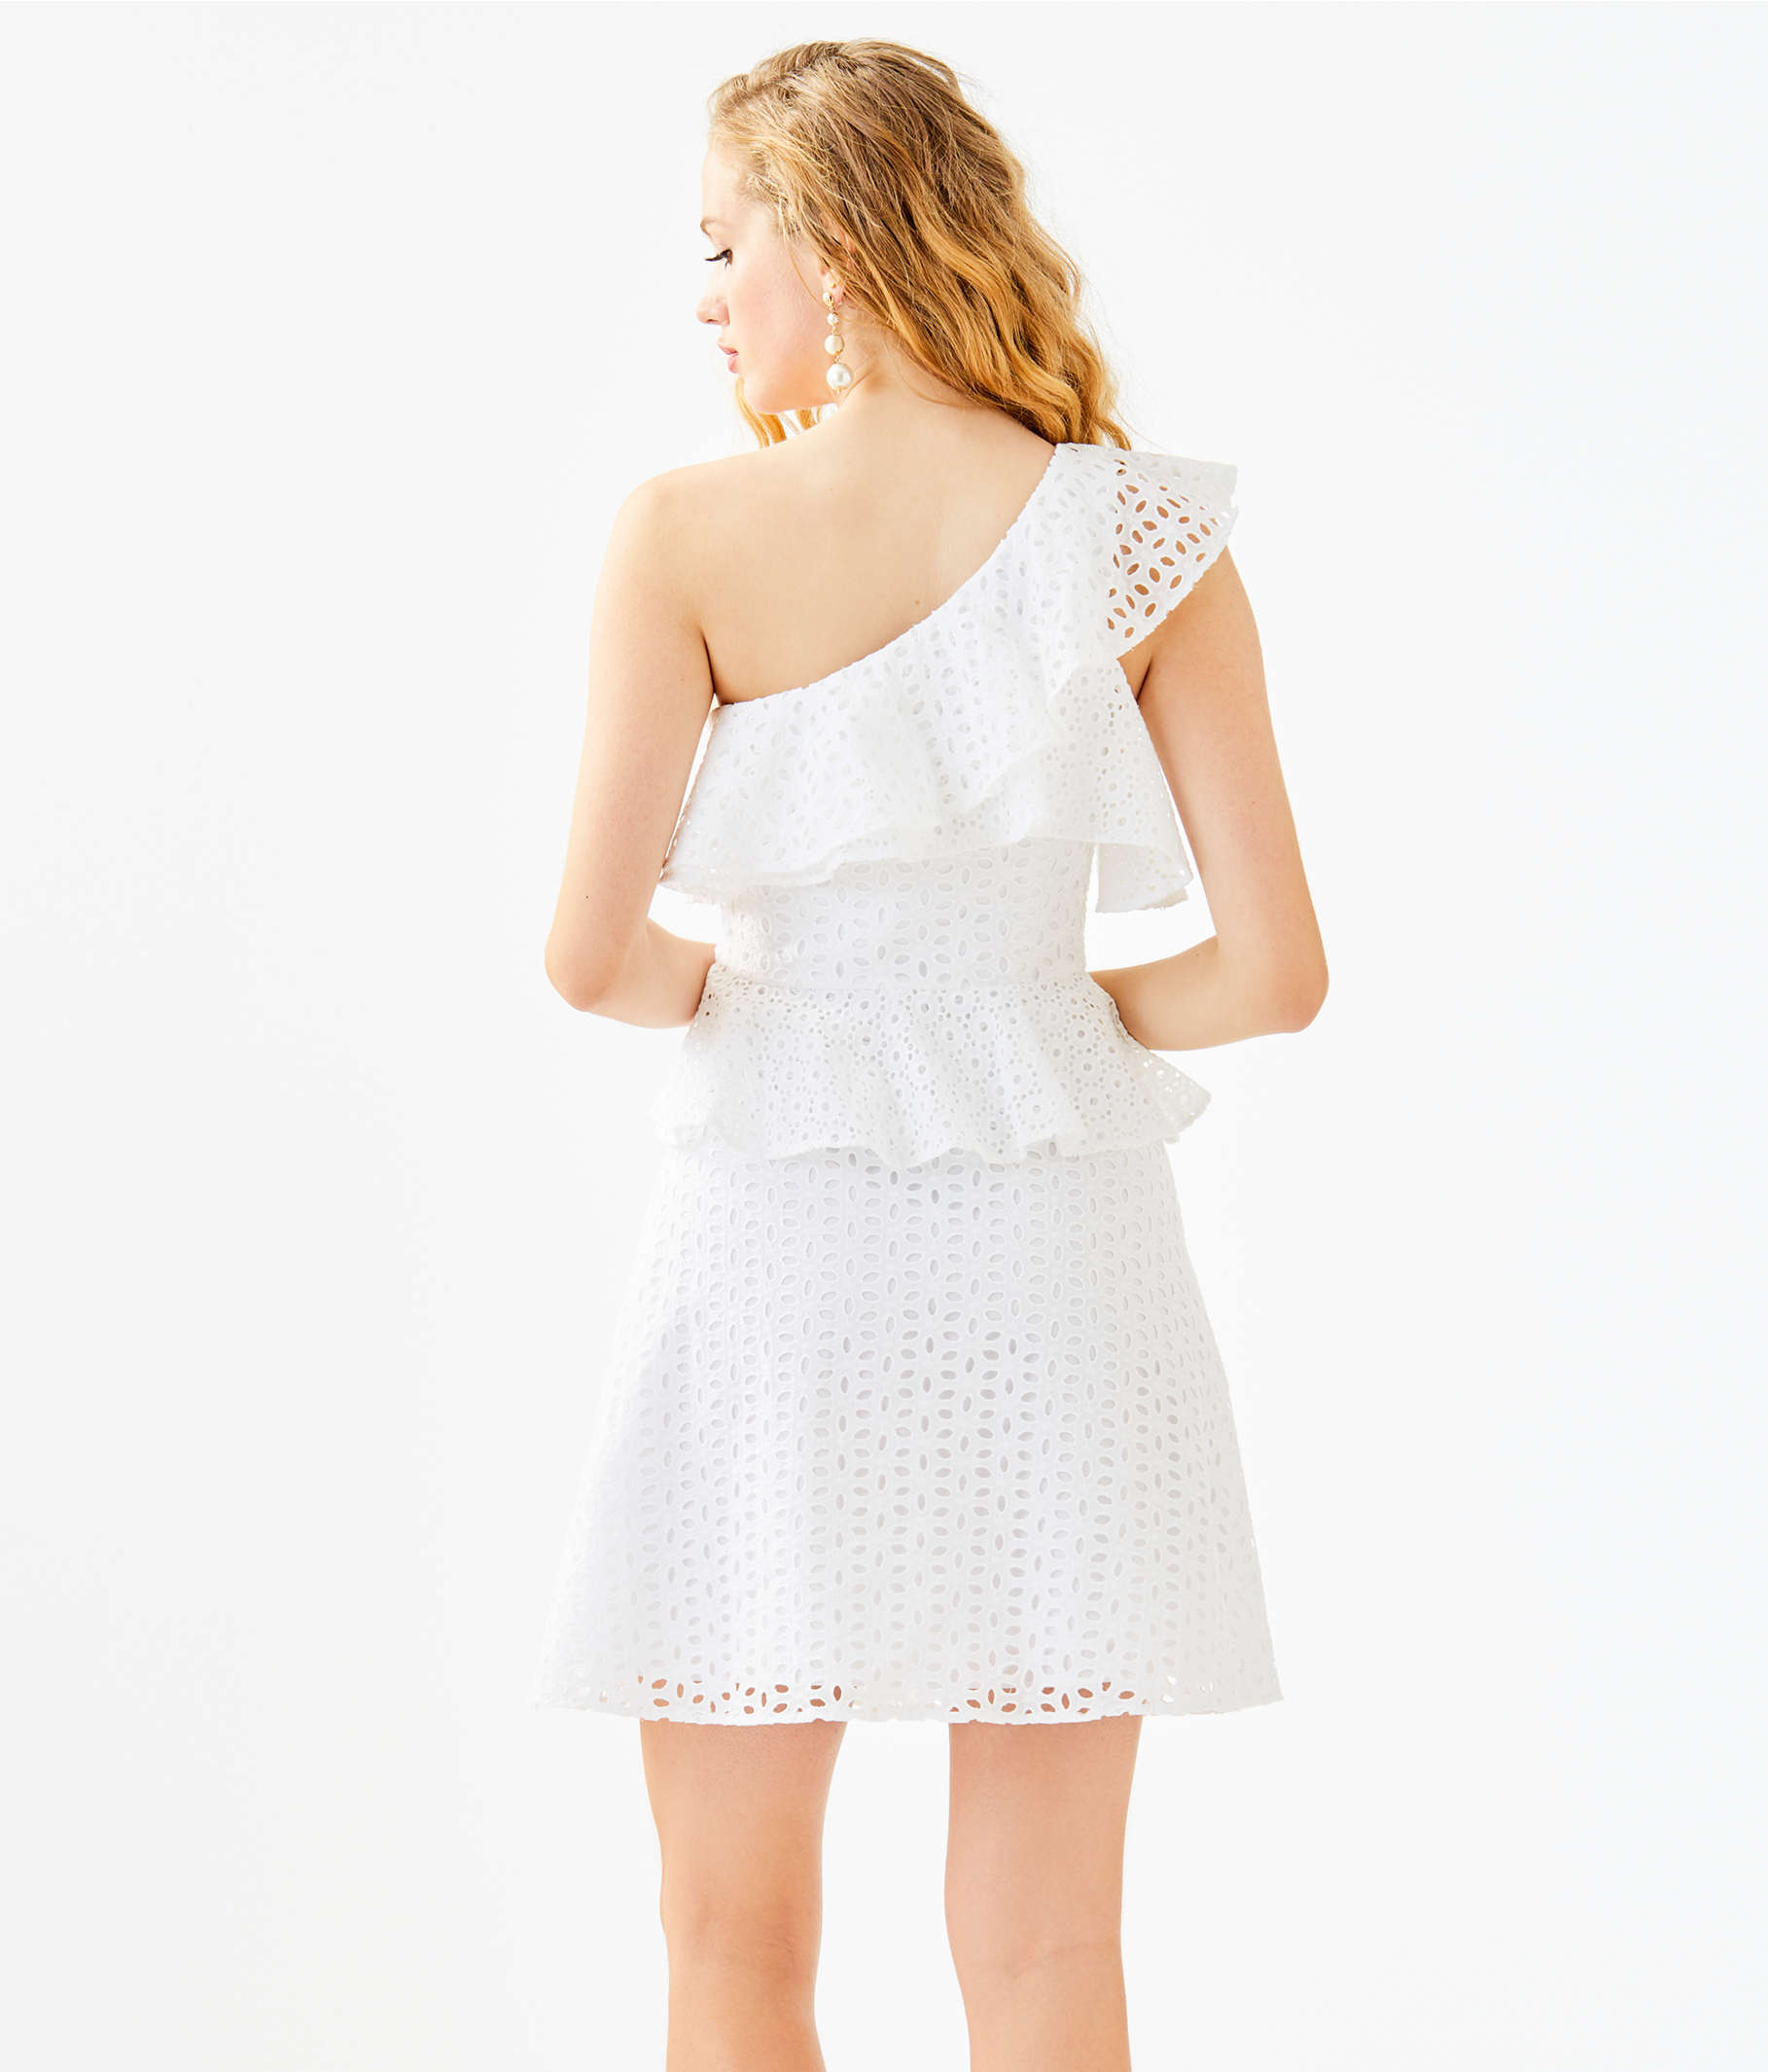 846dafbca6 ... Josey One Shoulder Dress